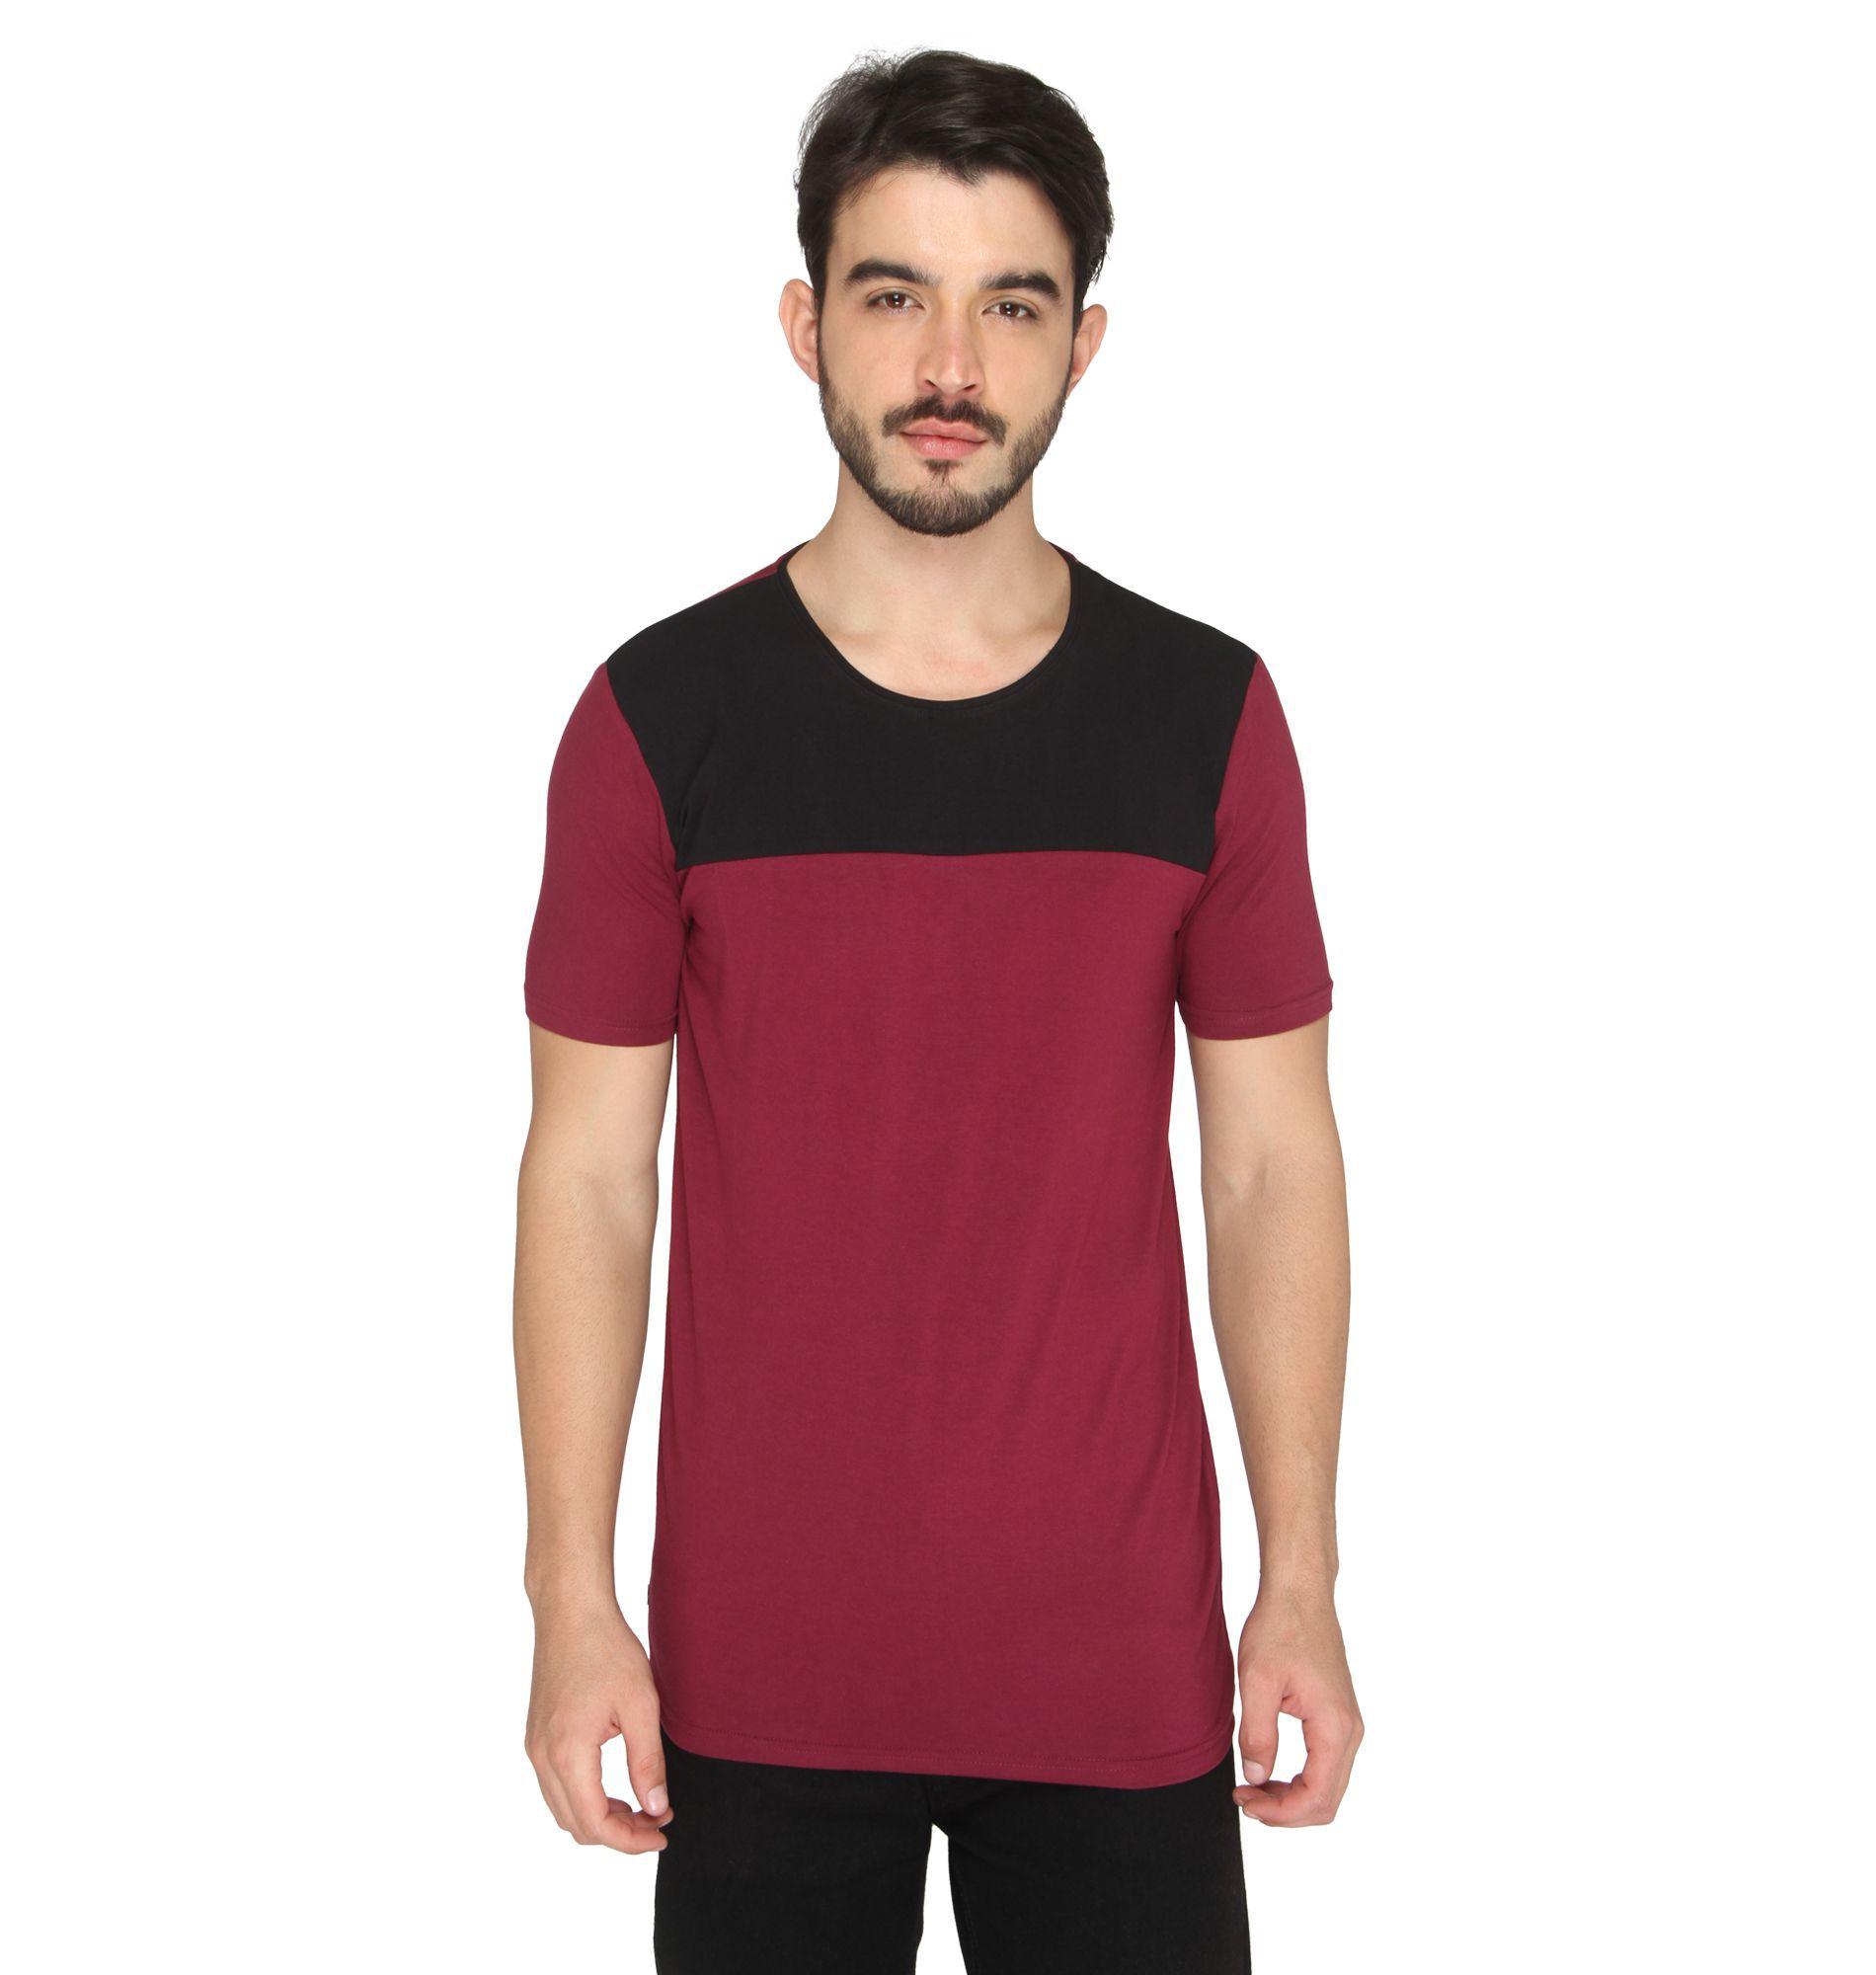 Drastic Maroon Round T-Shirt